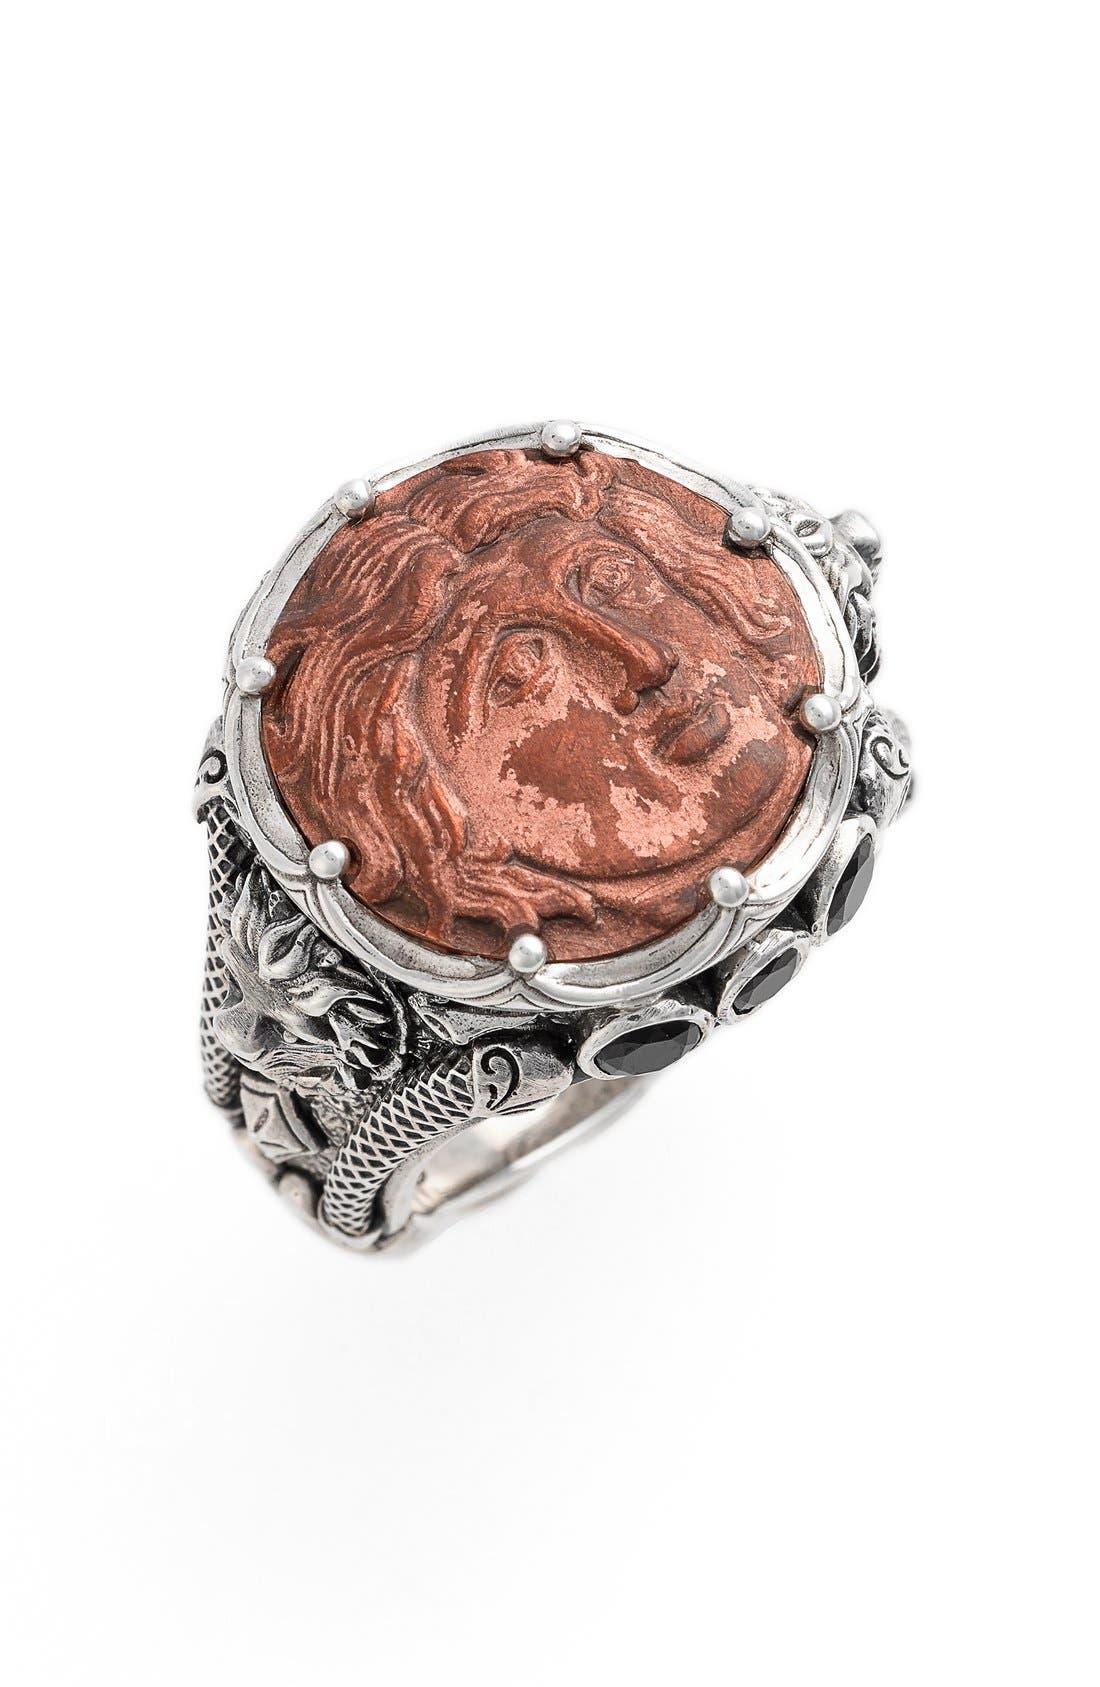 Alternate Image 1 Selected - Konstantino 'Aeolous' Greek Coin Ring